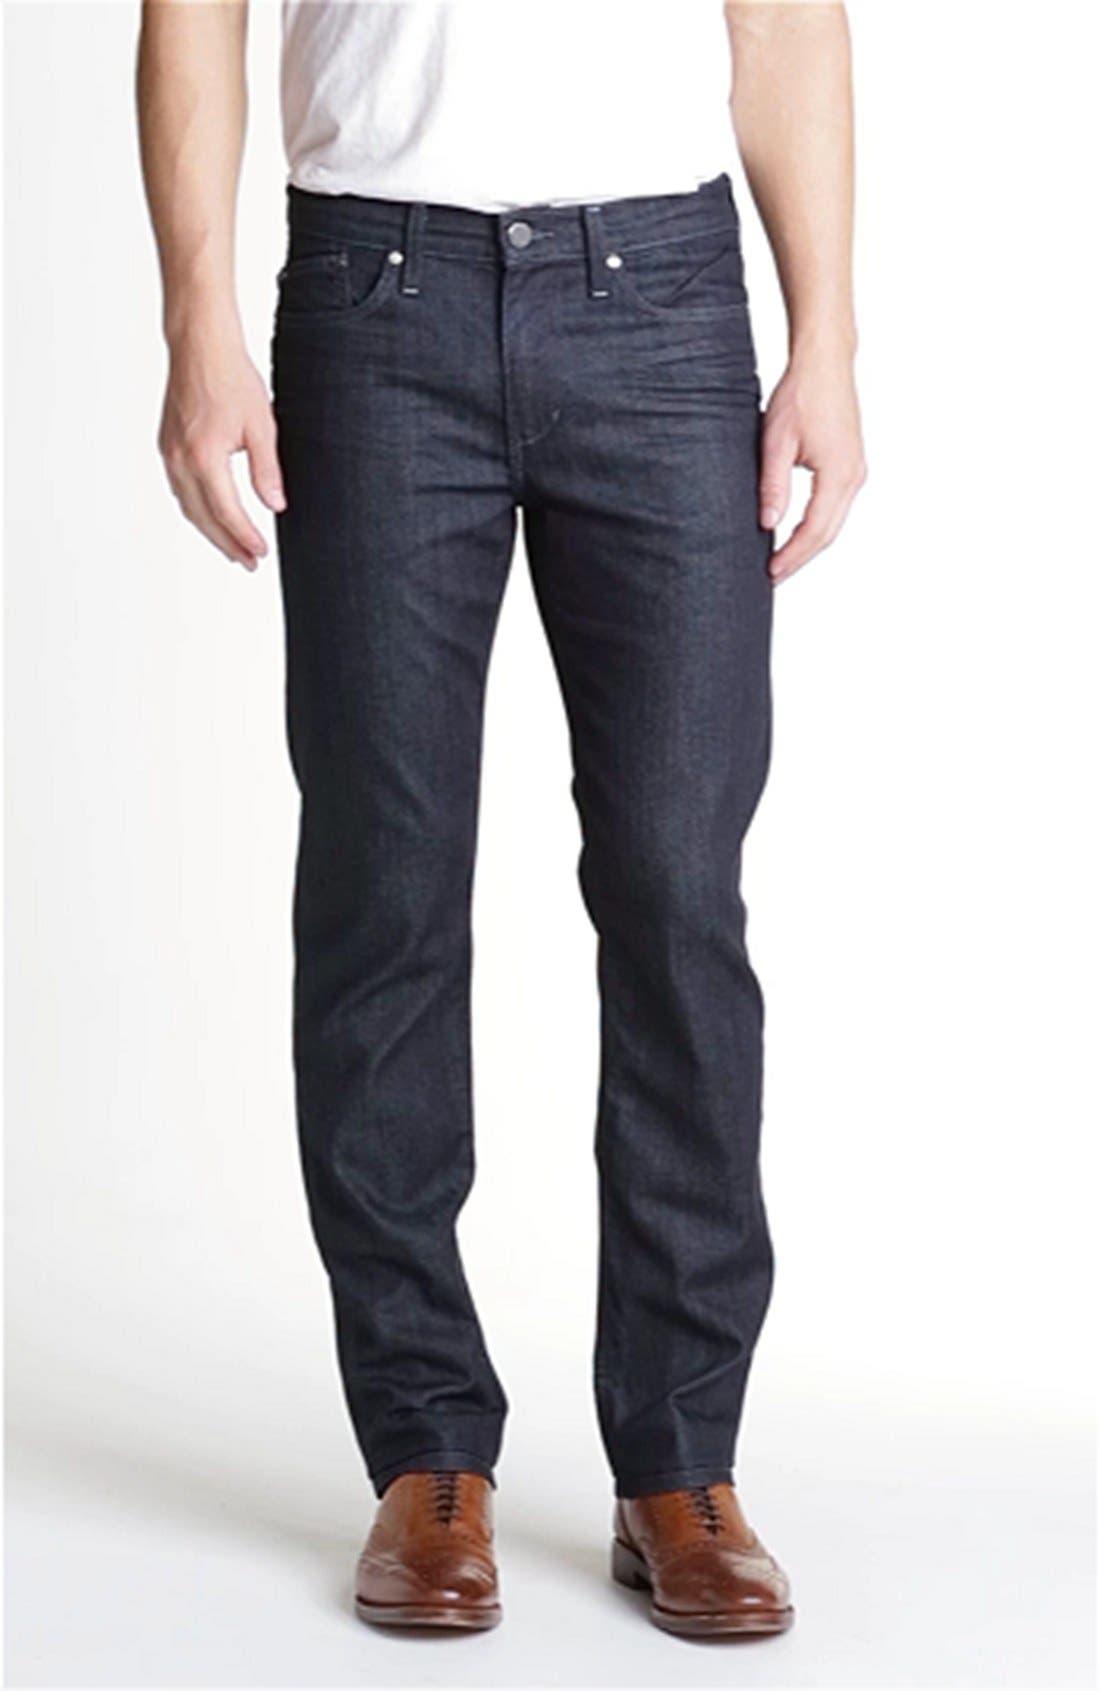 Brixton Slim Straight Fit Jeans,                             Alternate thumbnail 7, color,                             KING